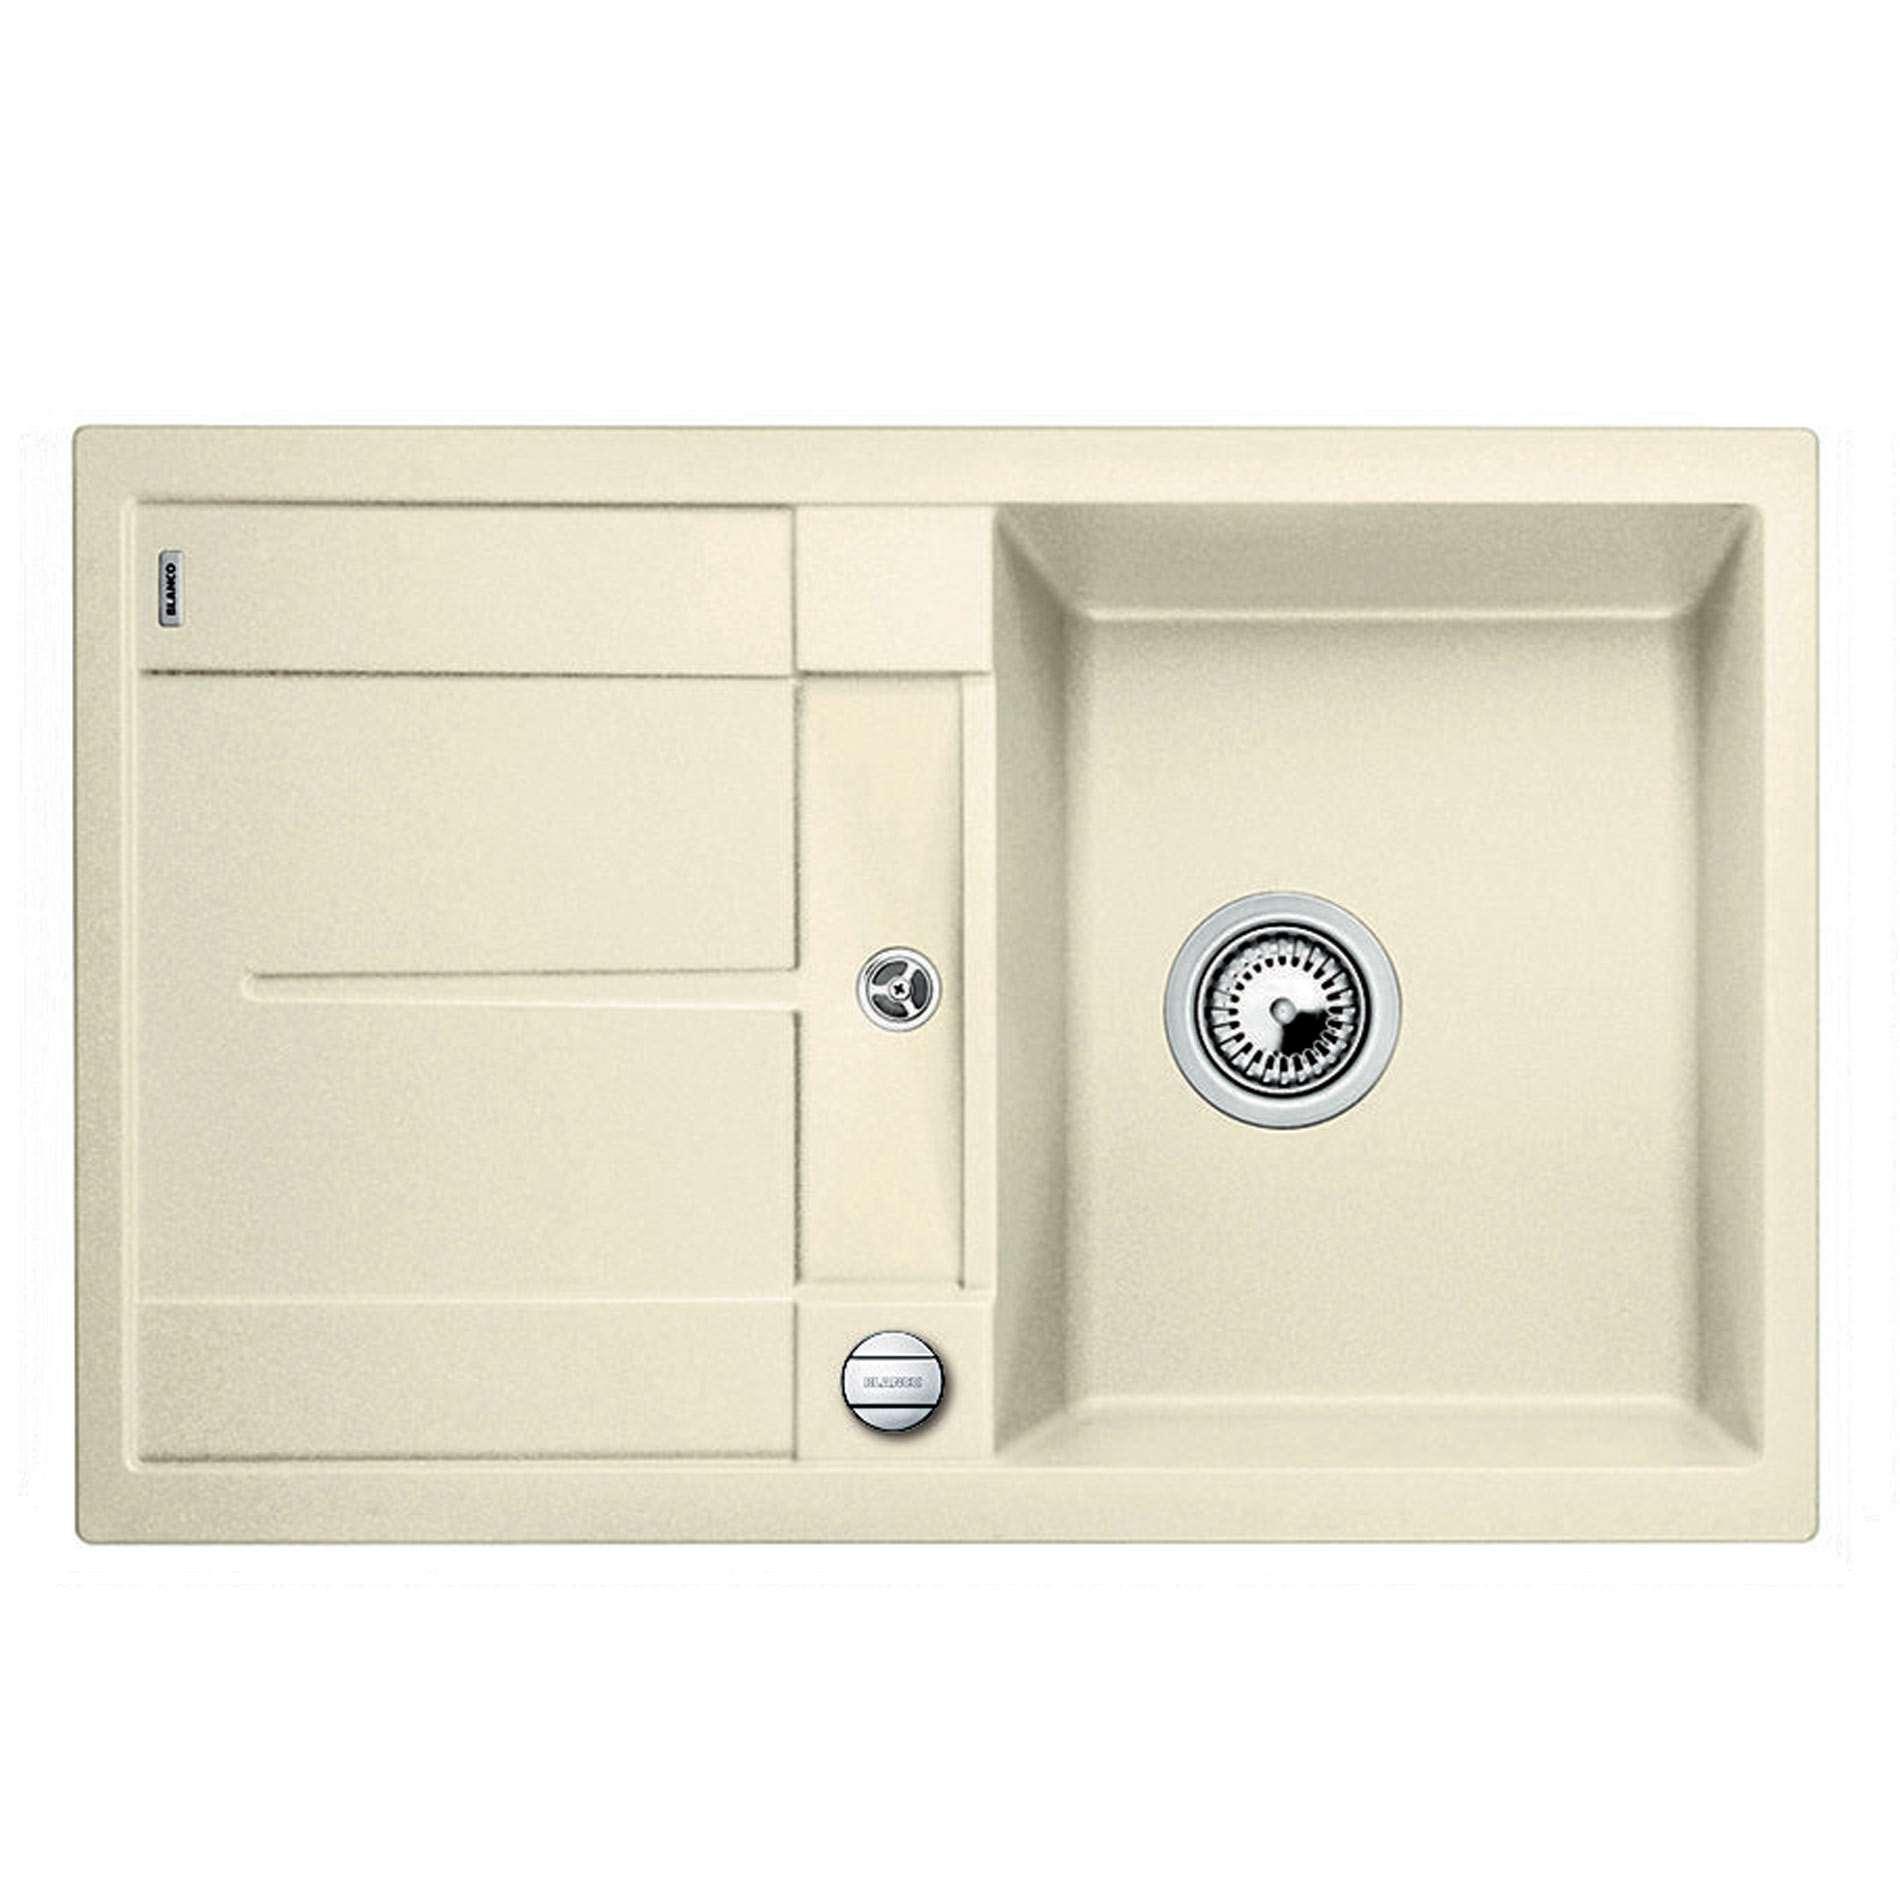 blanco metra 45 s jasmin silgranit sink kitchen sinks. Black Bedroom Furniture Sets. Home Design Ideas